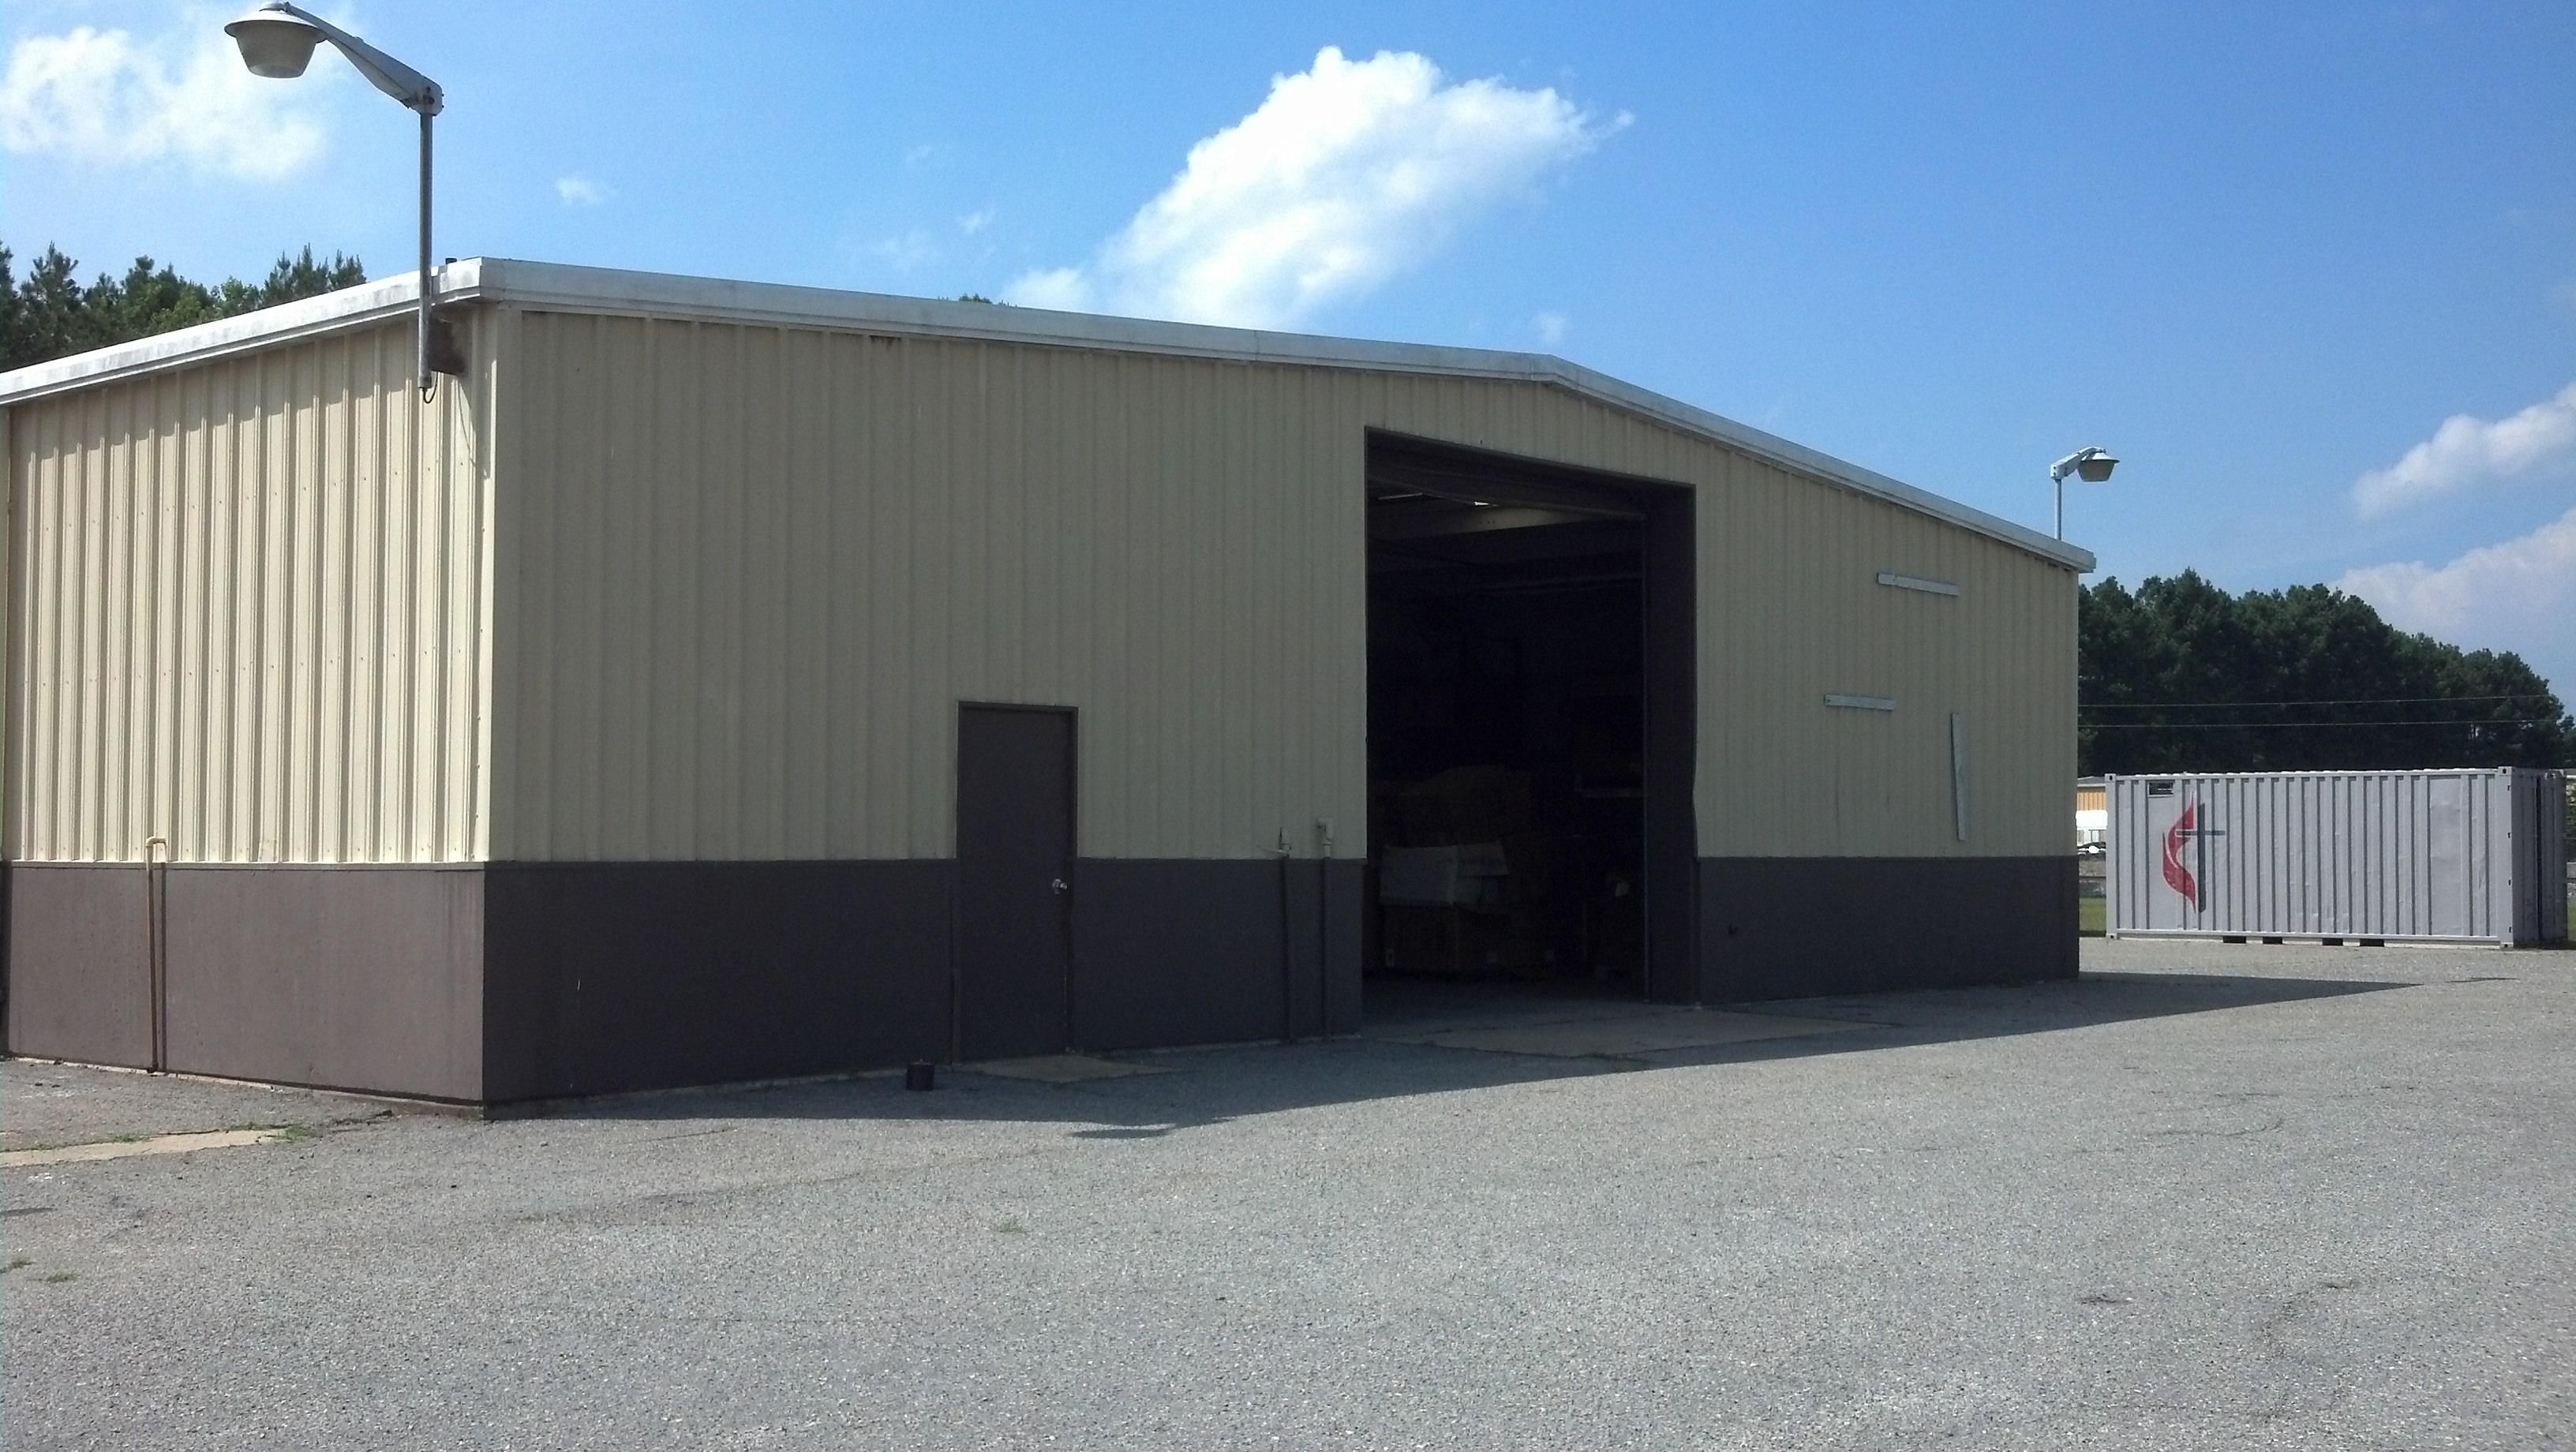 Goldsboro Methodist Men Help House Disaster Supplies : img20130628160047002 from eastncredcross.wordpress.com size 3264 x 1840 jpeg 1047kB